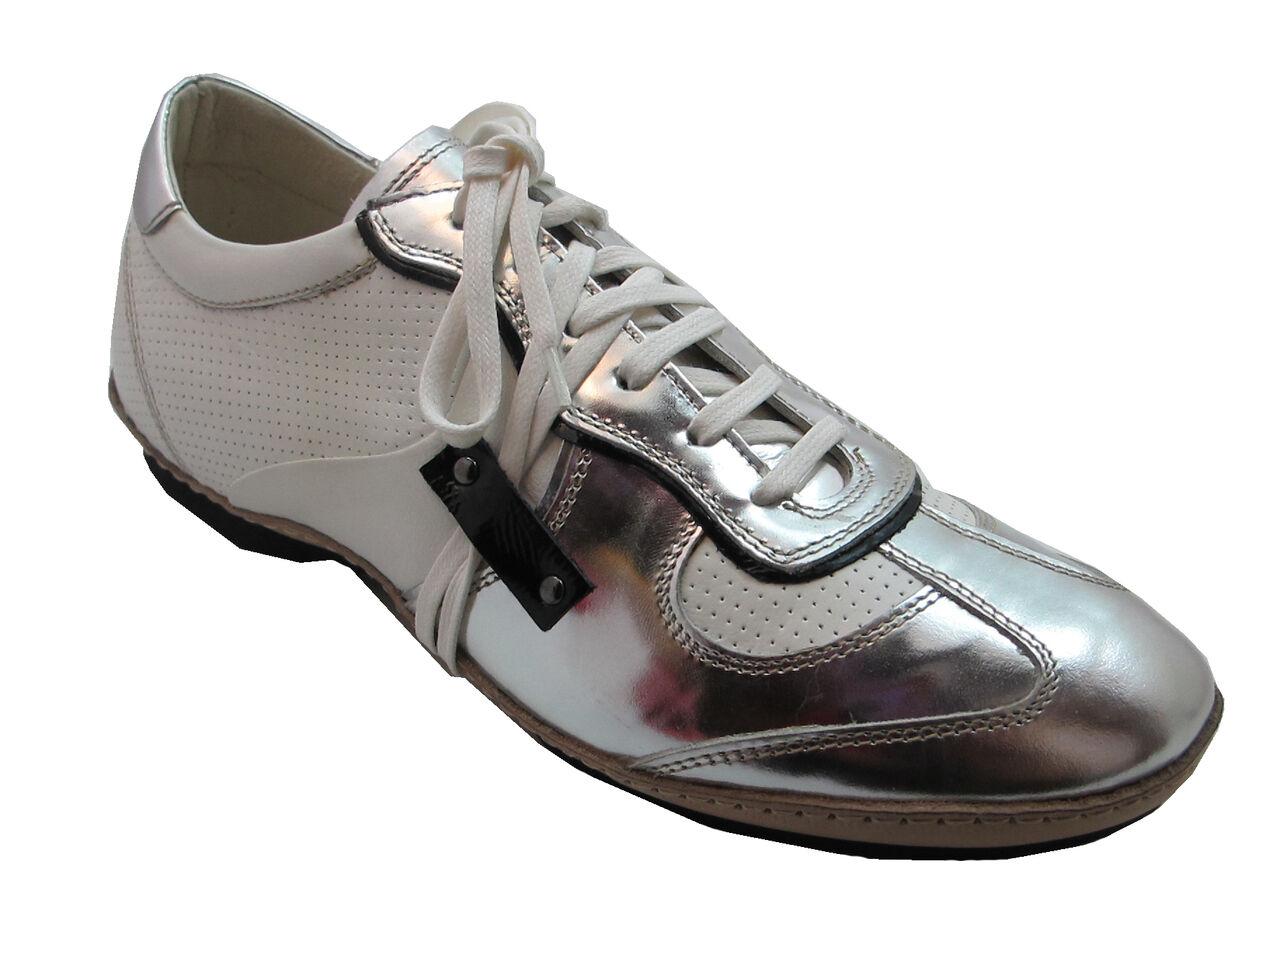 Frontiera 4395 Men's Fashion Italian sneakers white Silver, Black White